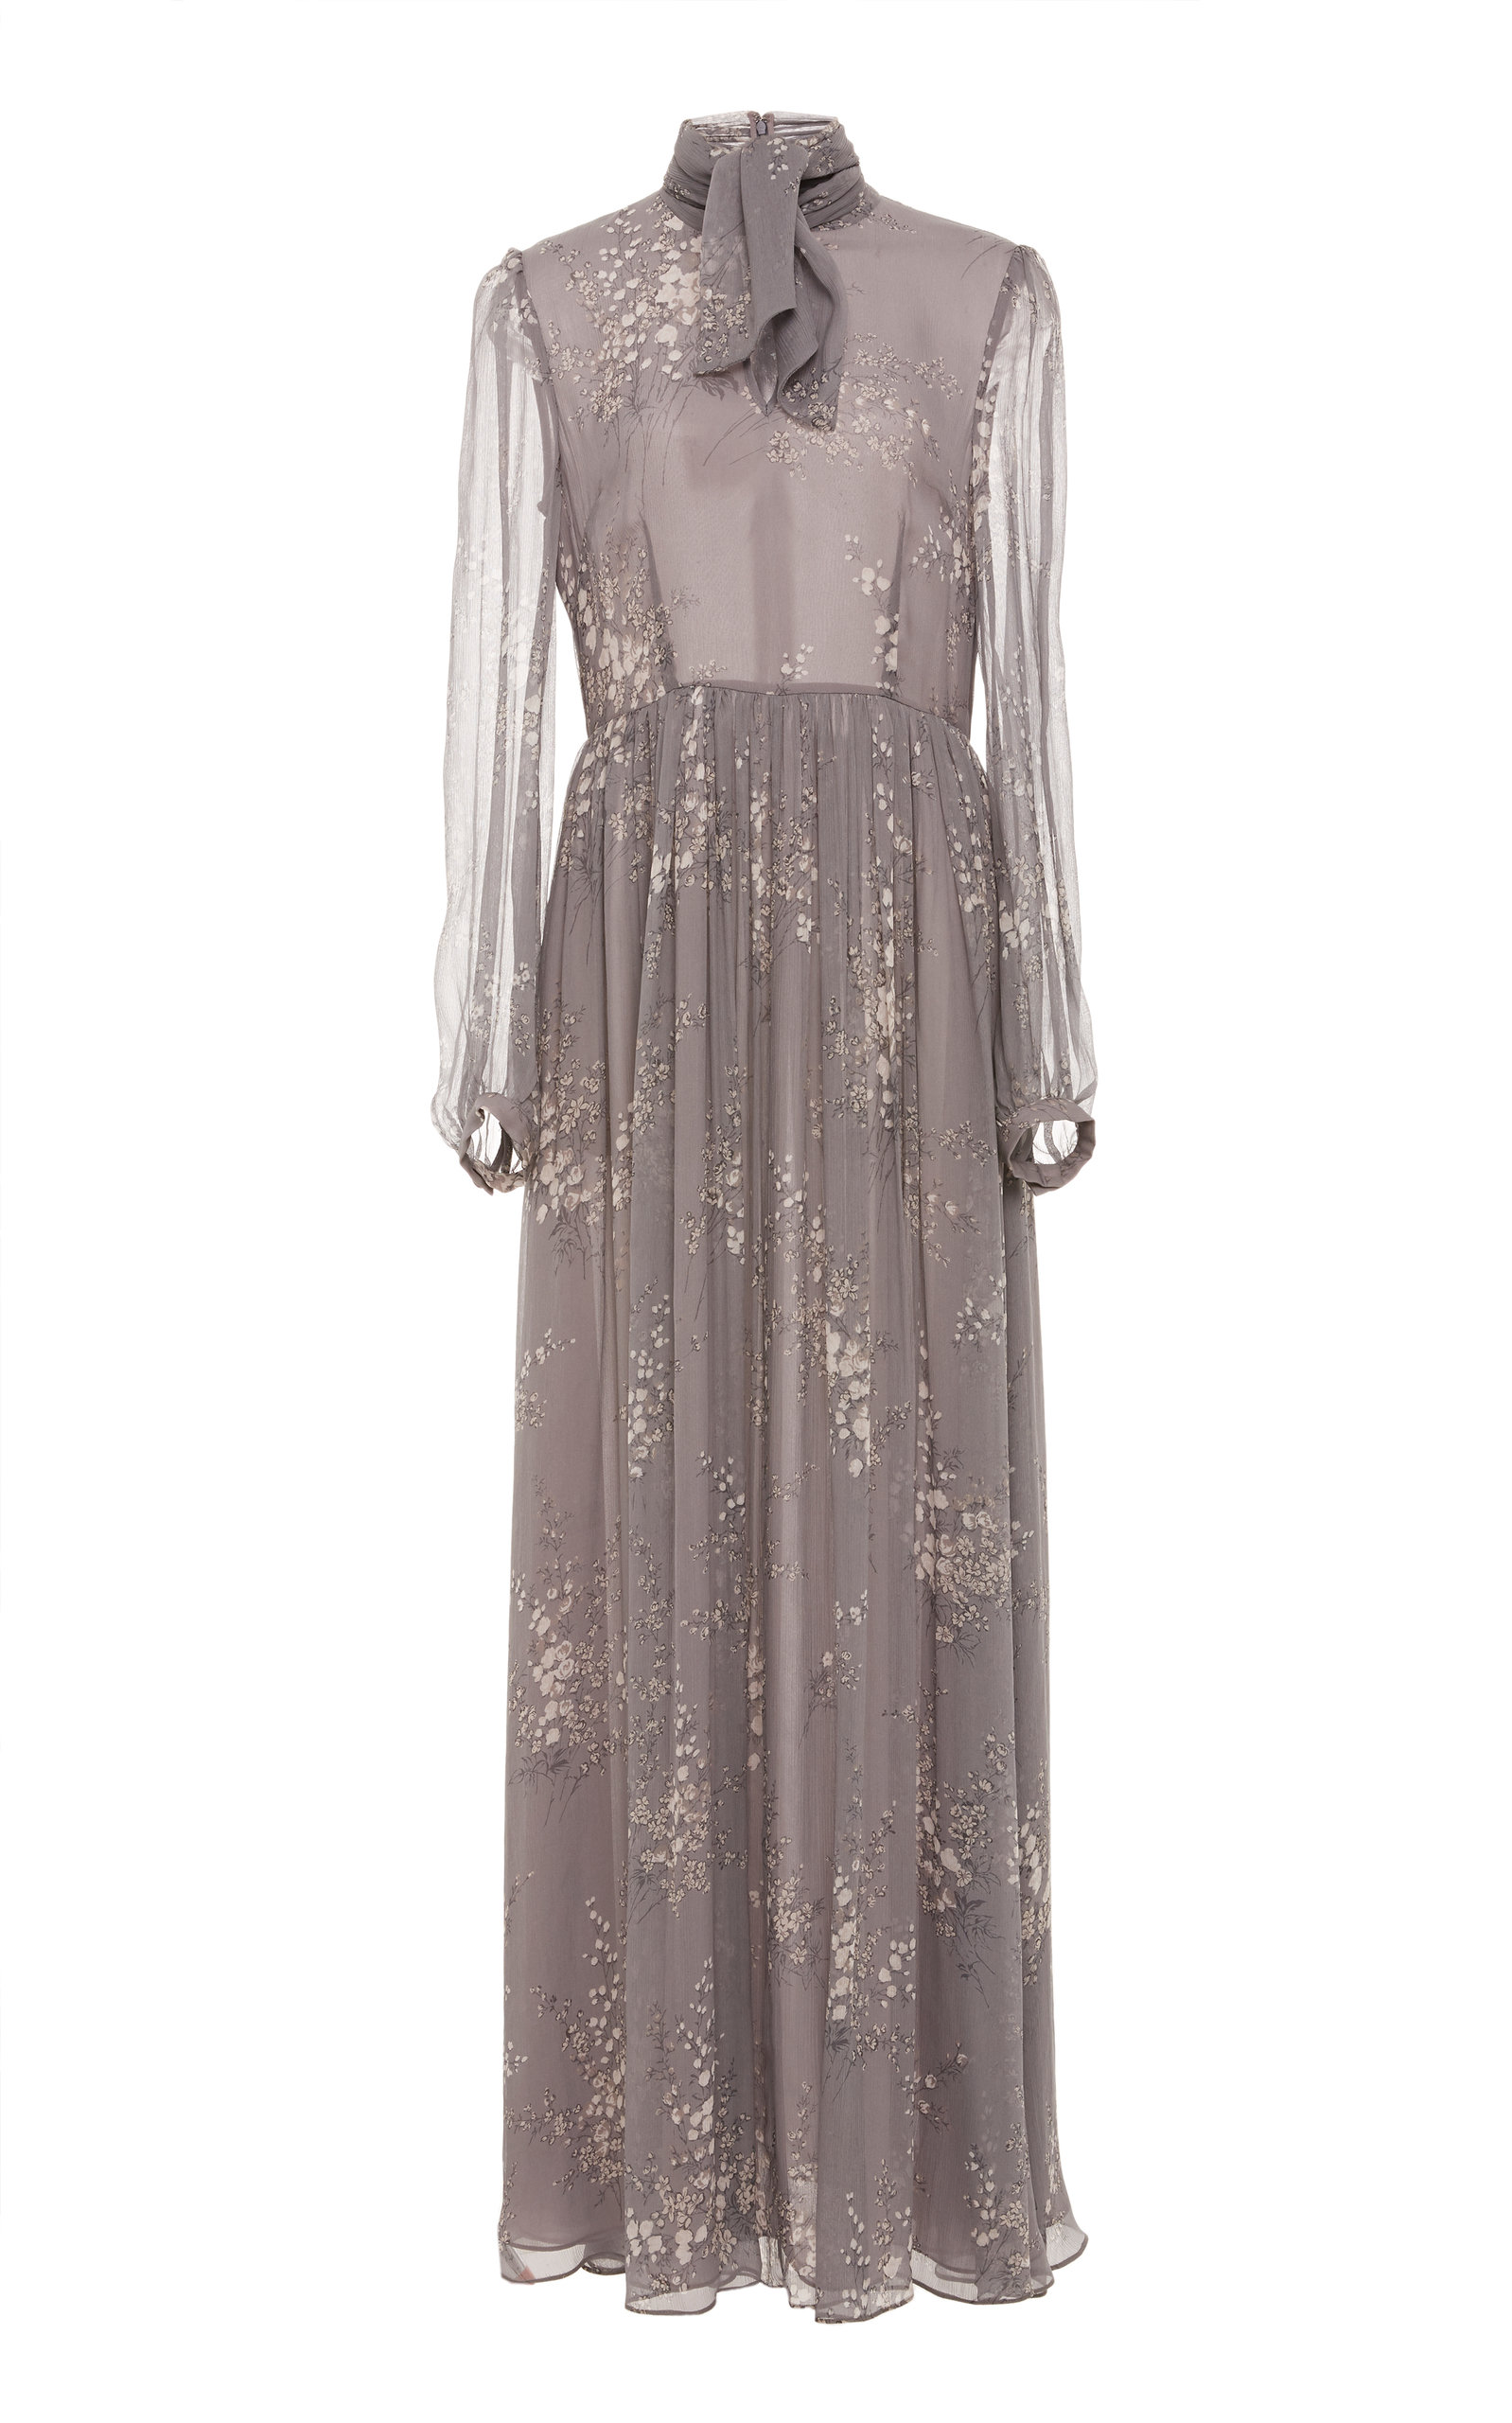 Tie-Neck Long-Sleeve Floral-Print Silk Crinkled Chiffon Long Dress in Grey